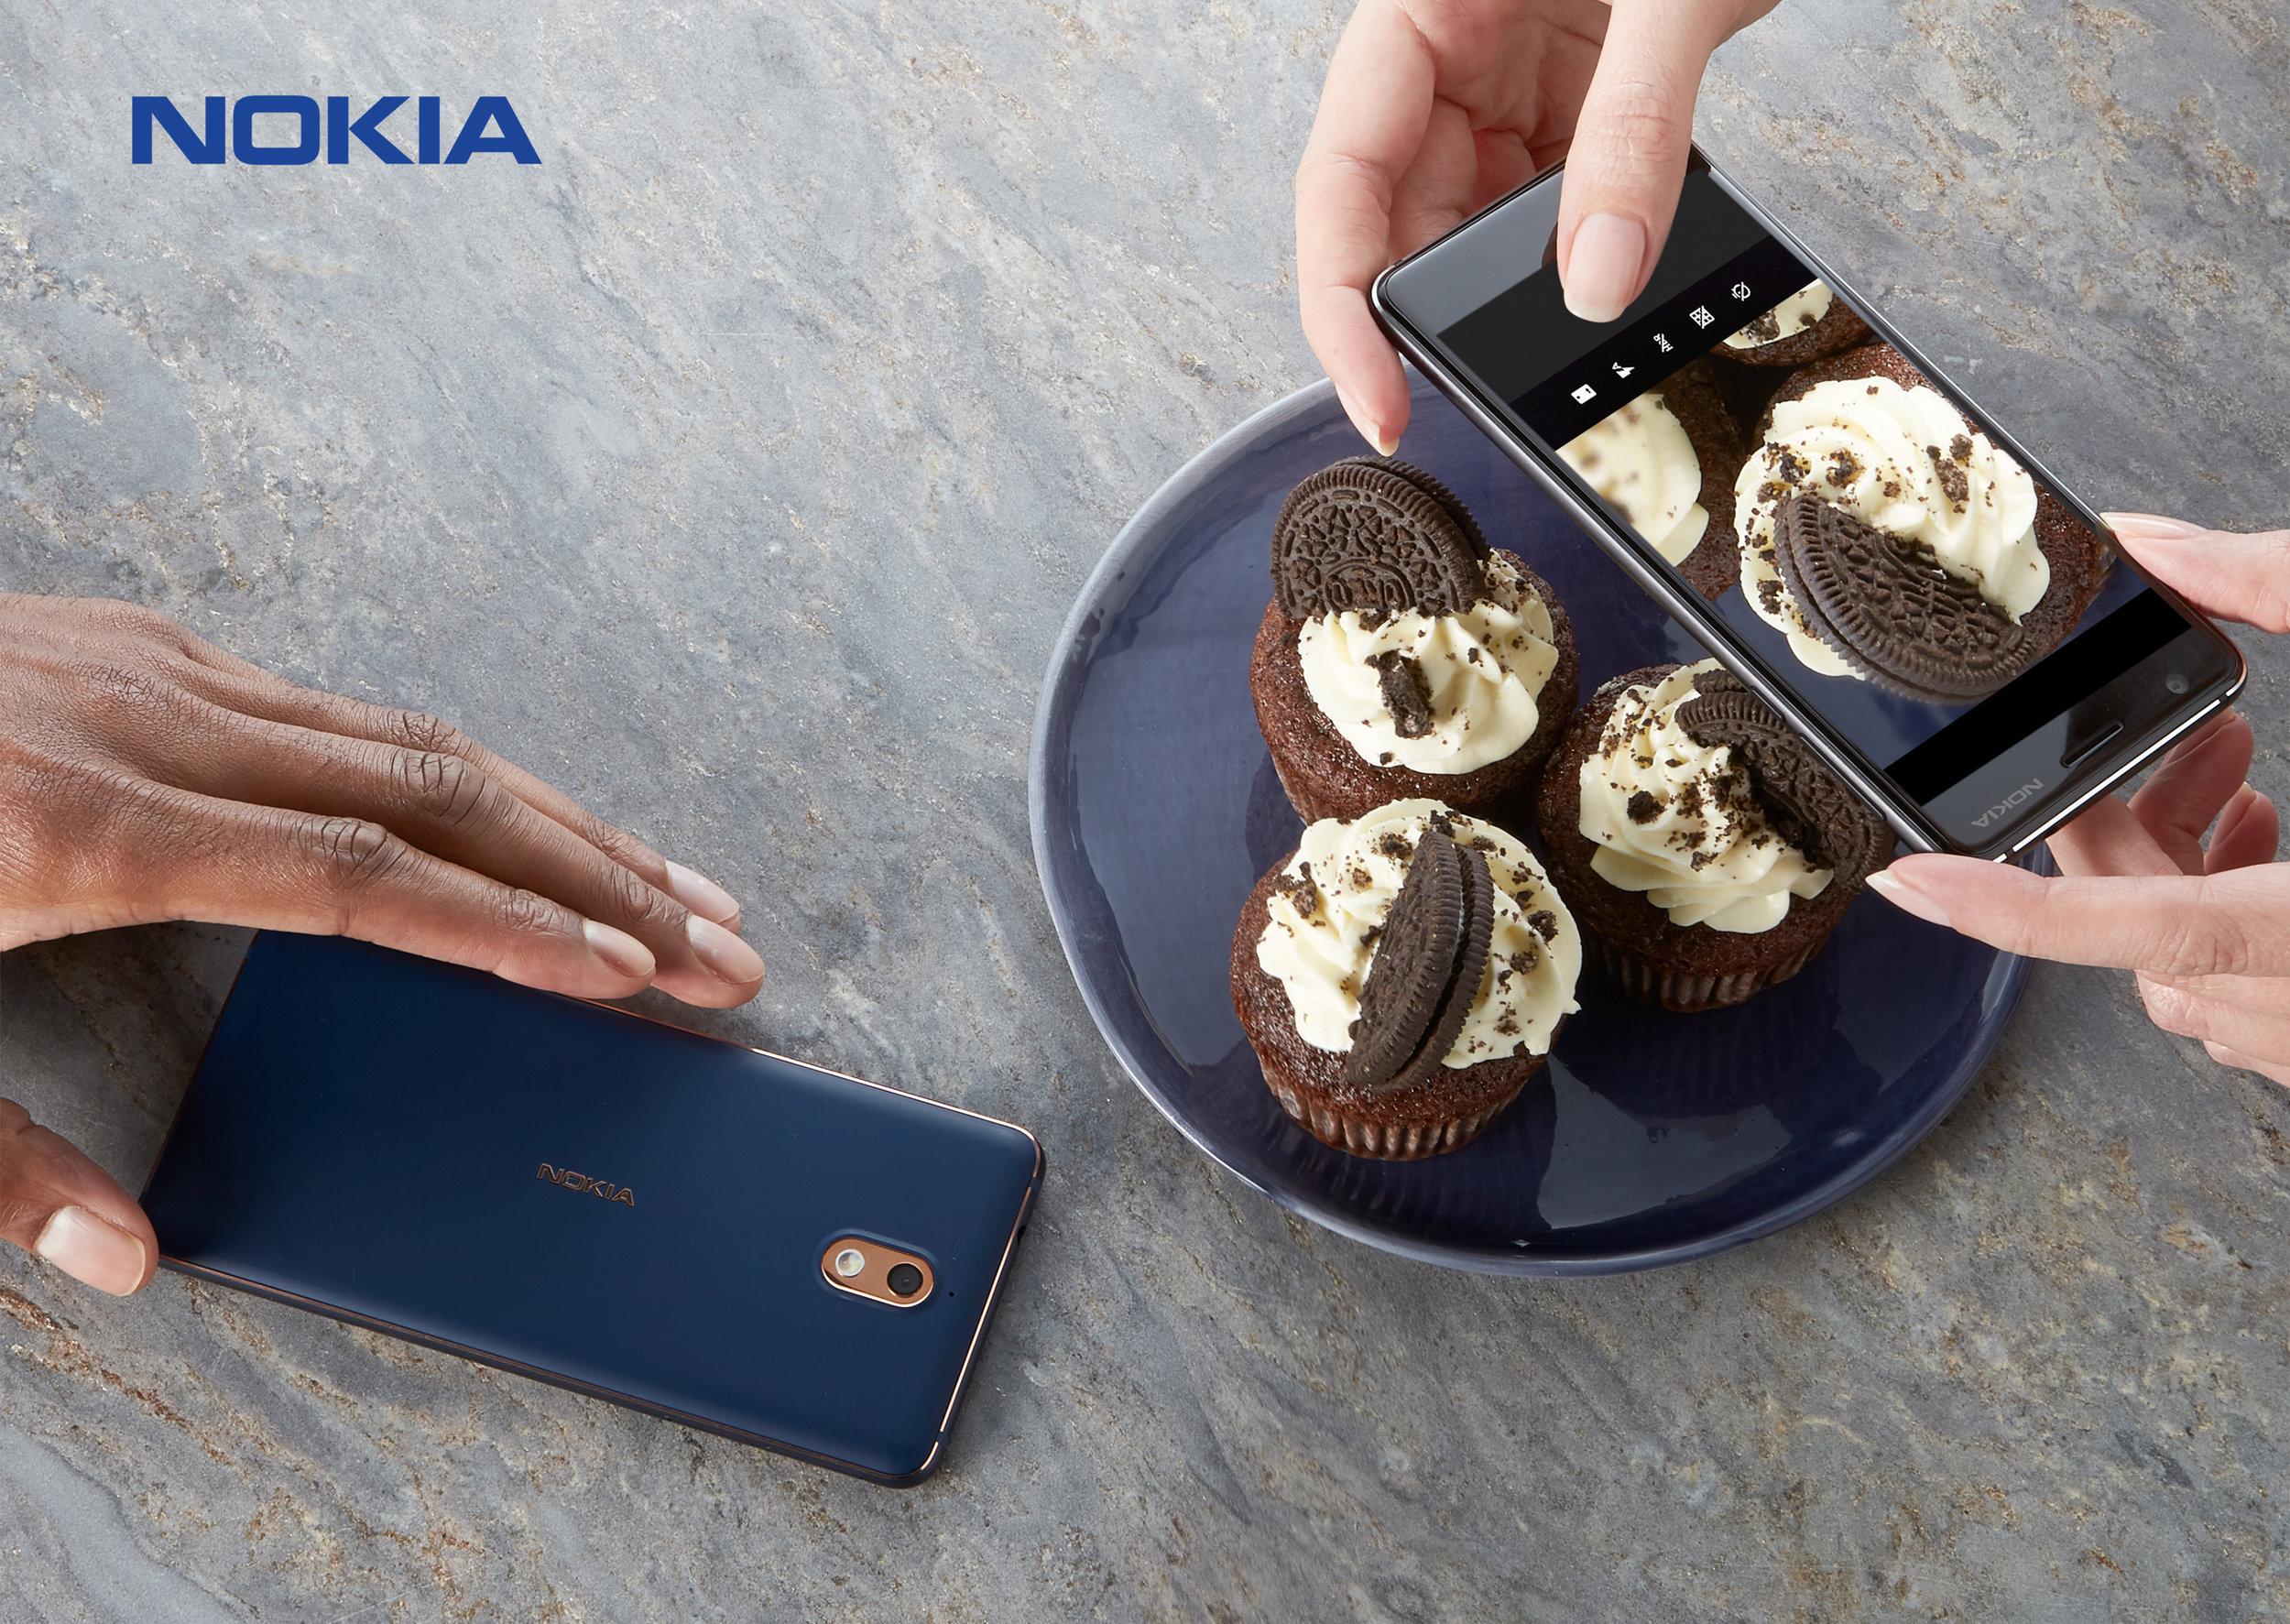 Nokia - Phone Durability RET-TFc.jpg